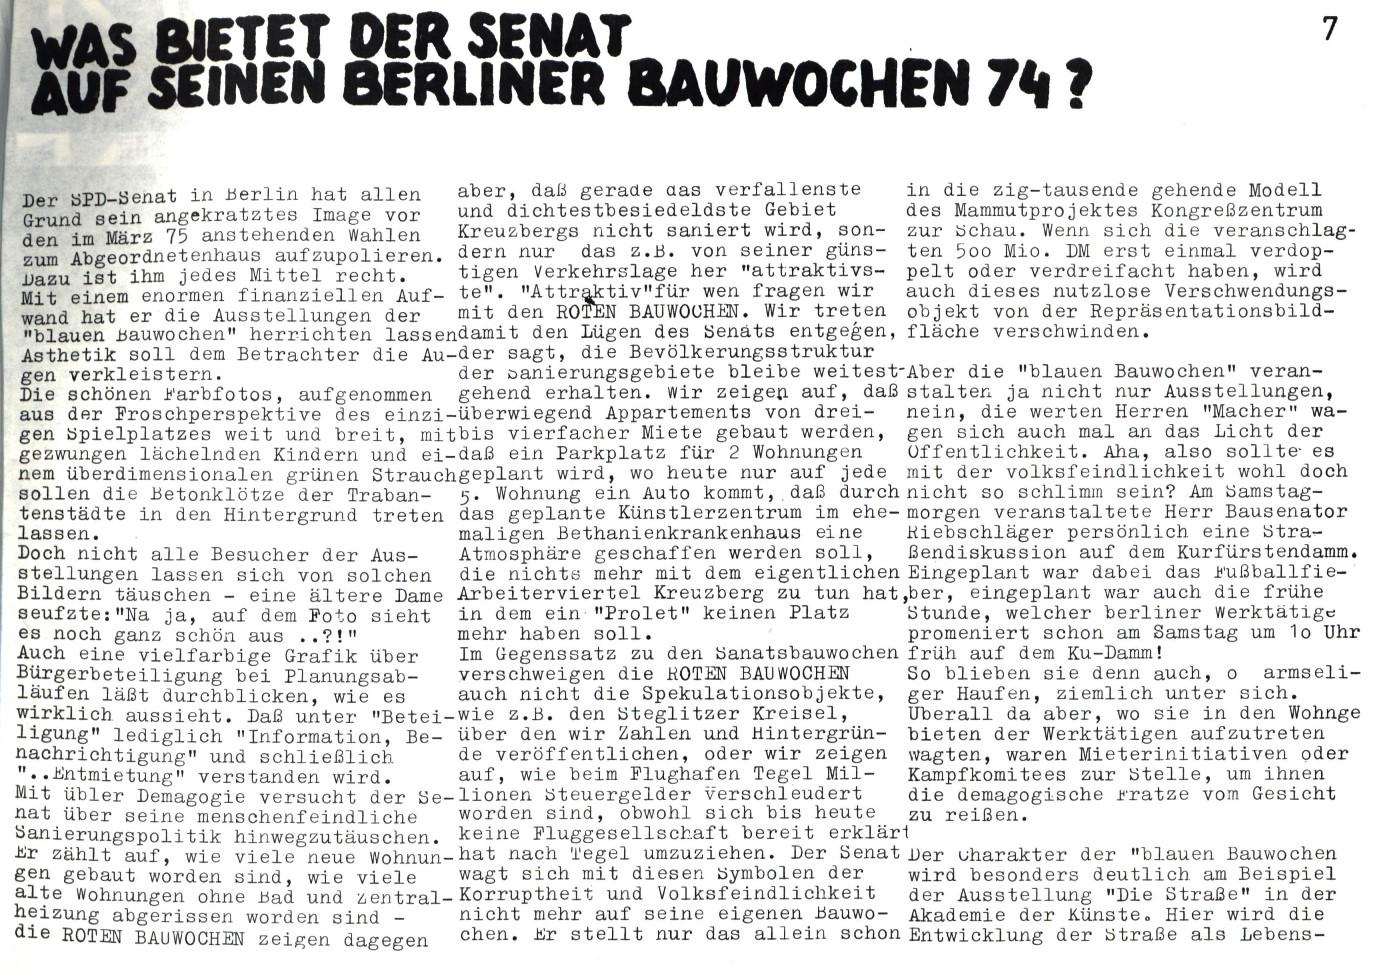 Berlin_KSV_1974_Rote_Bauwochen_13